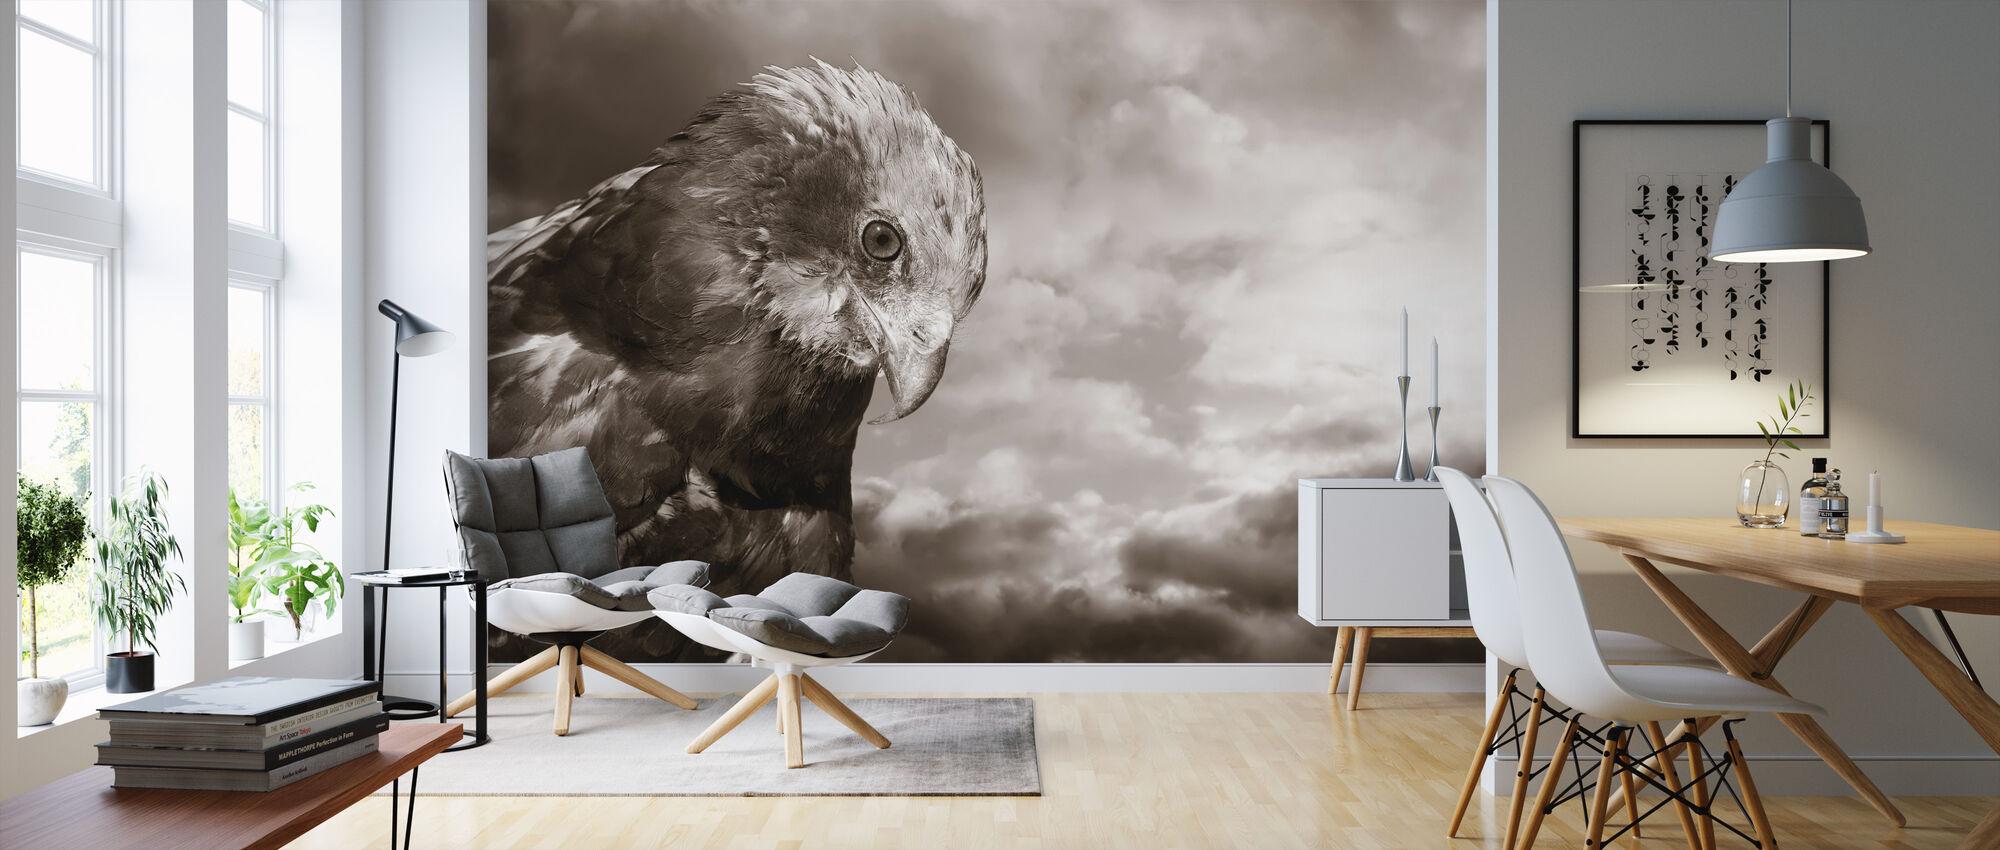 Eagle - Sepia - Wallpaper - Living Room